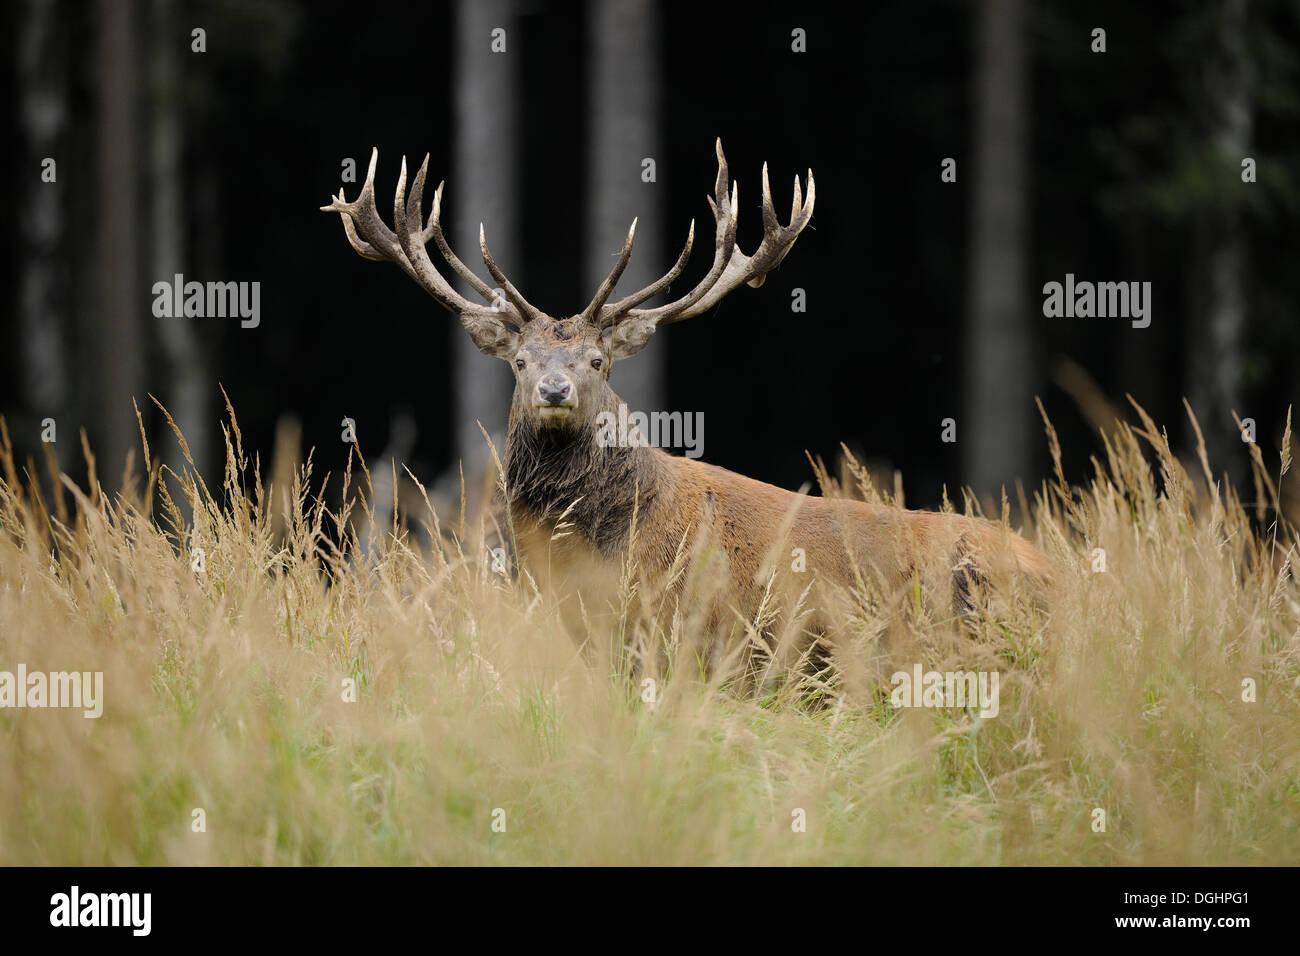 Red deer (Cervus elaphus), stag, captive, Lower Saxony, Germany Stock Photo